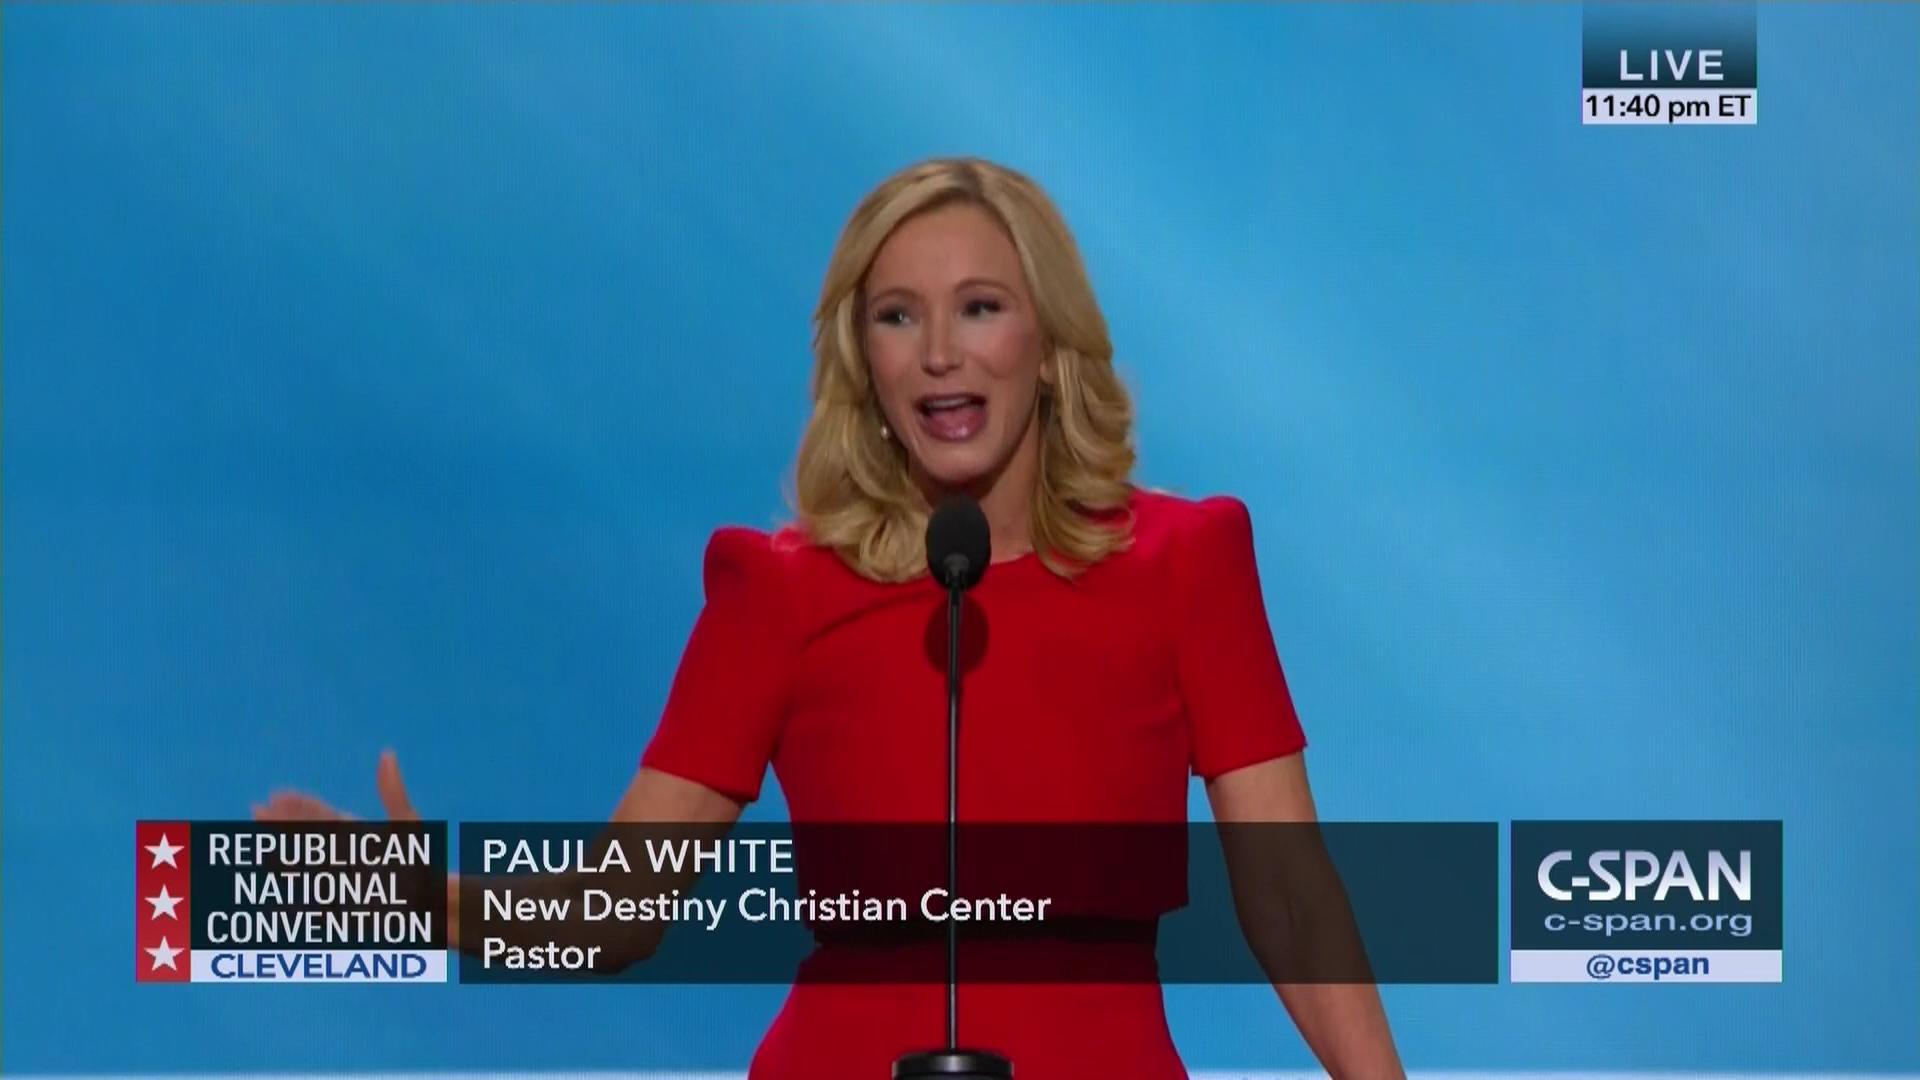 Pastor Paula White C Span Org